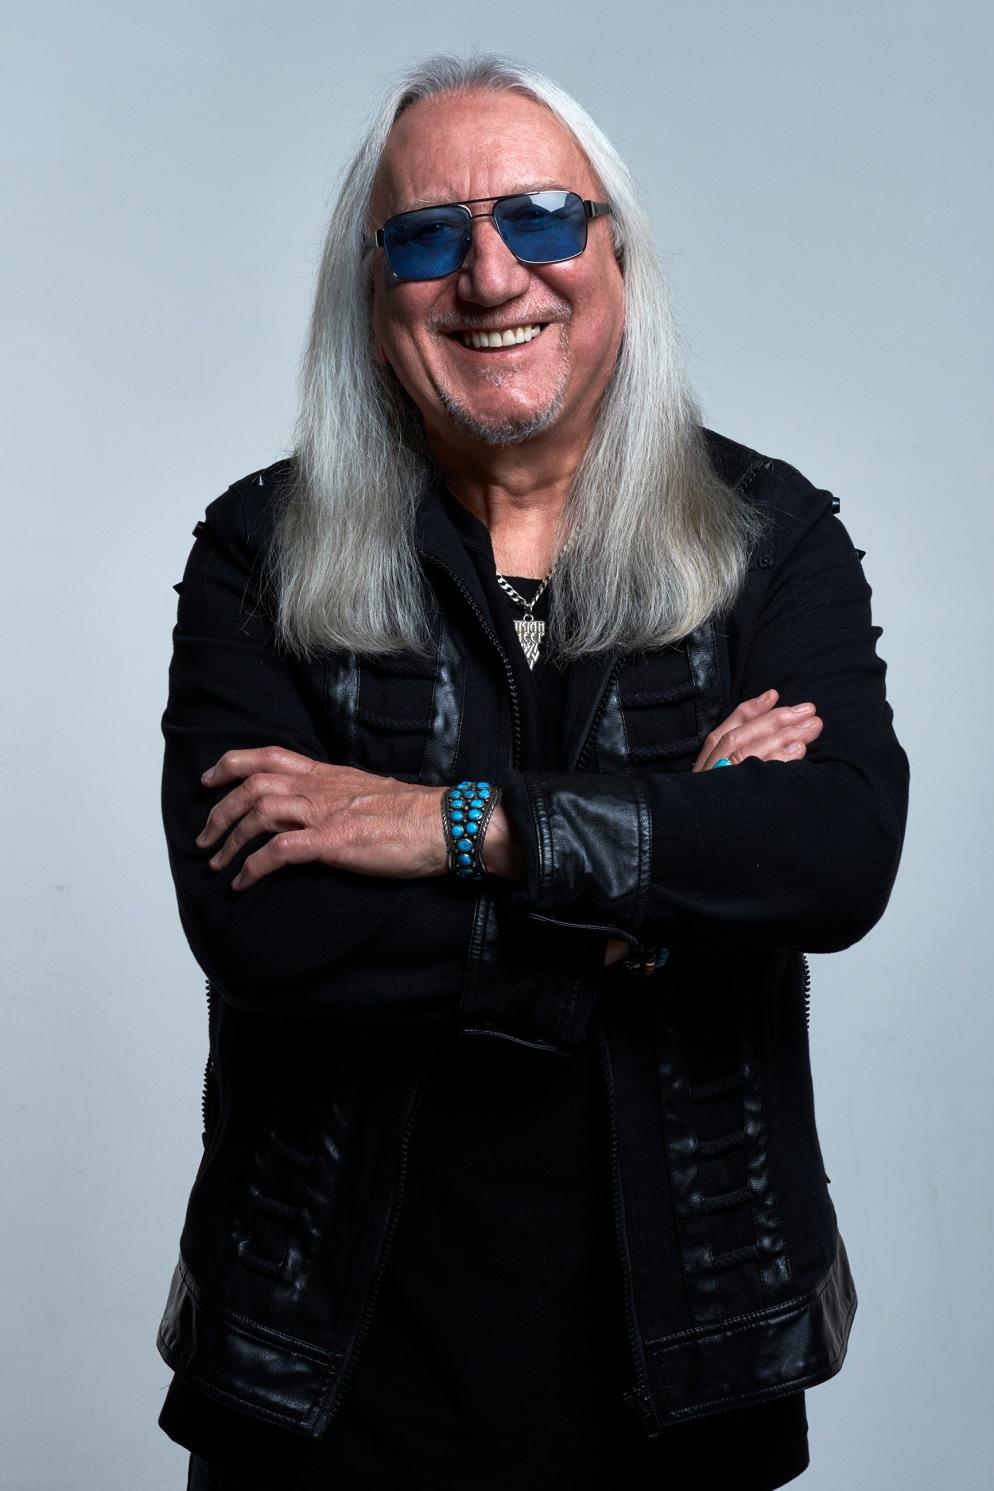 Uriah-Heep-Richard-Stow-0339-Mick Solo